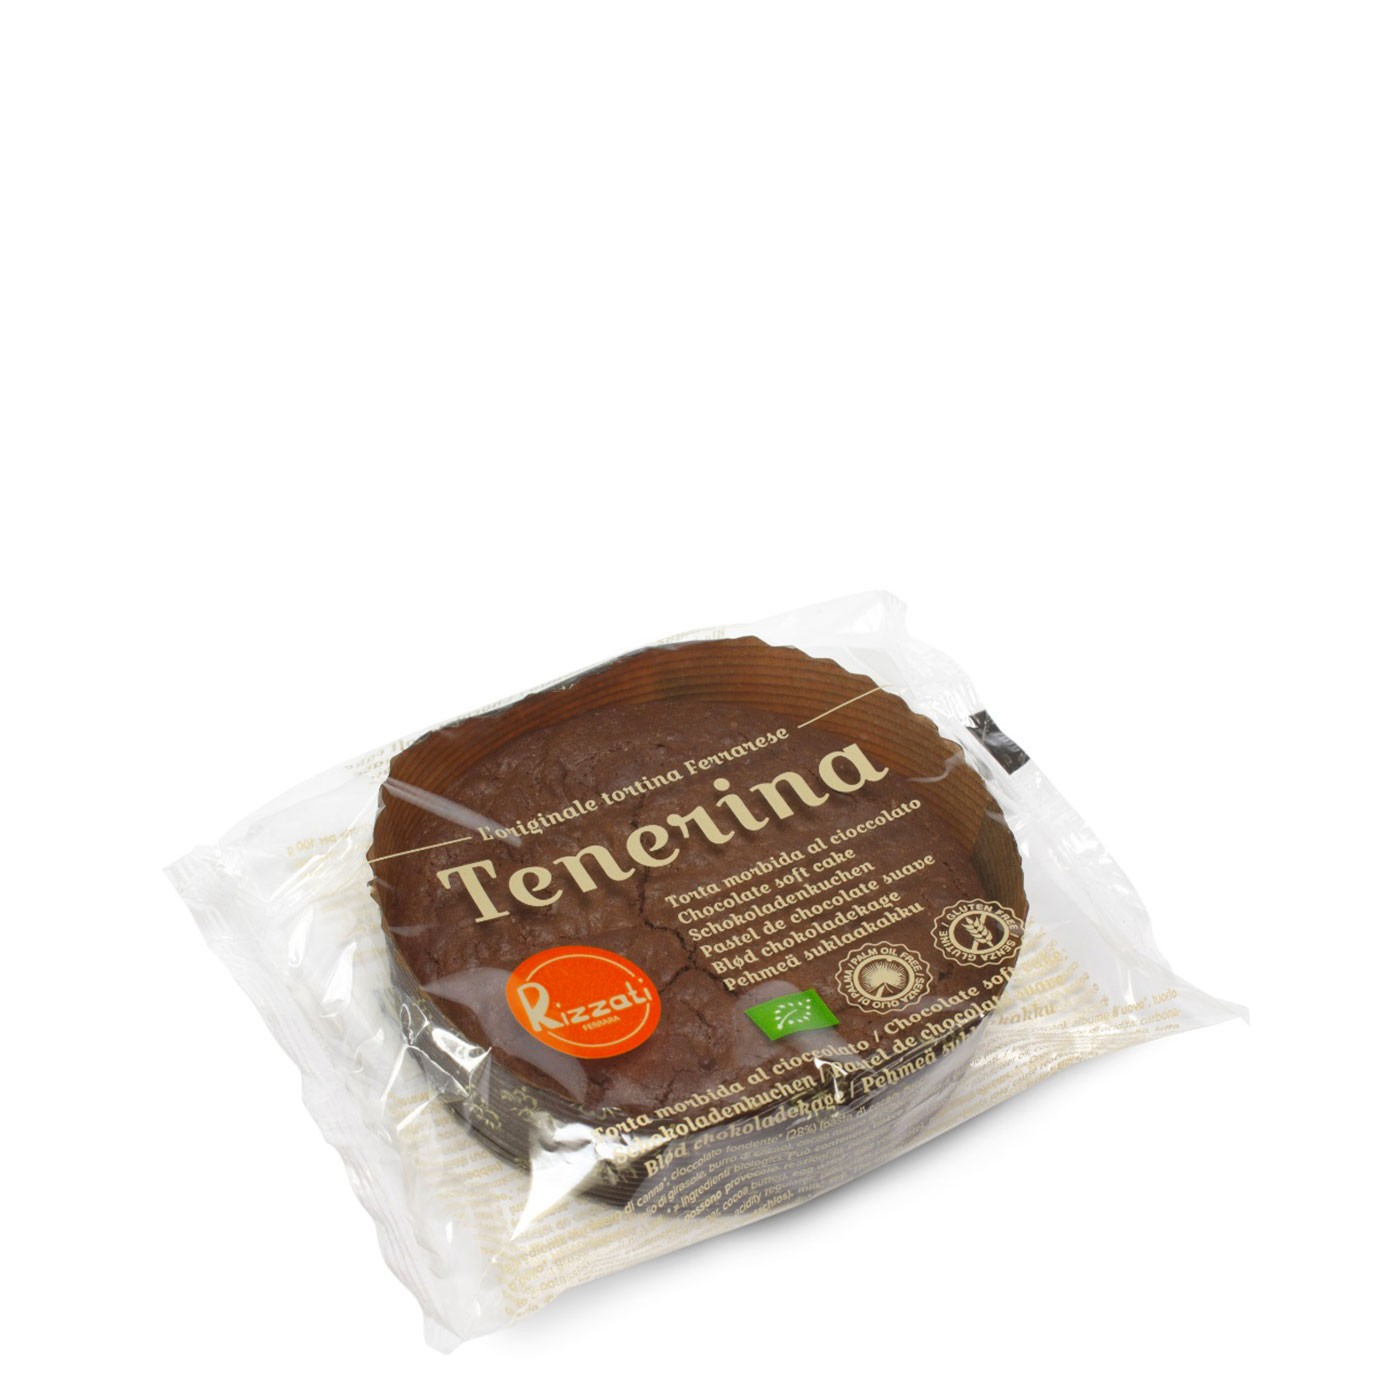 Organic Gluten Free Chocolate Tenerina Cake 1.76 oz - Rizzati | Eataly.com